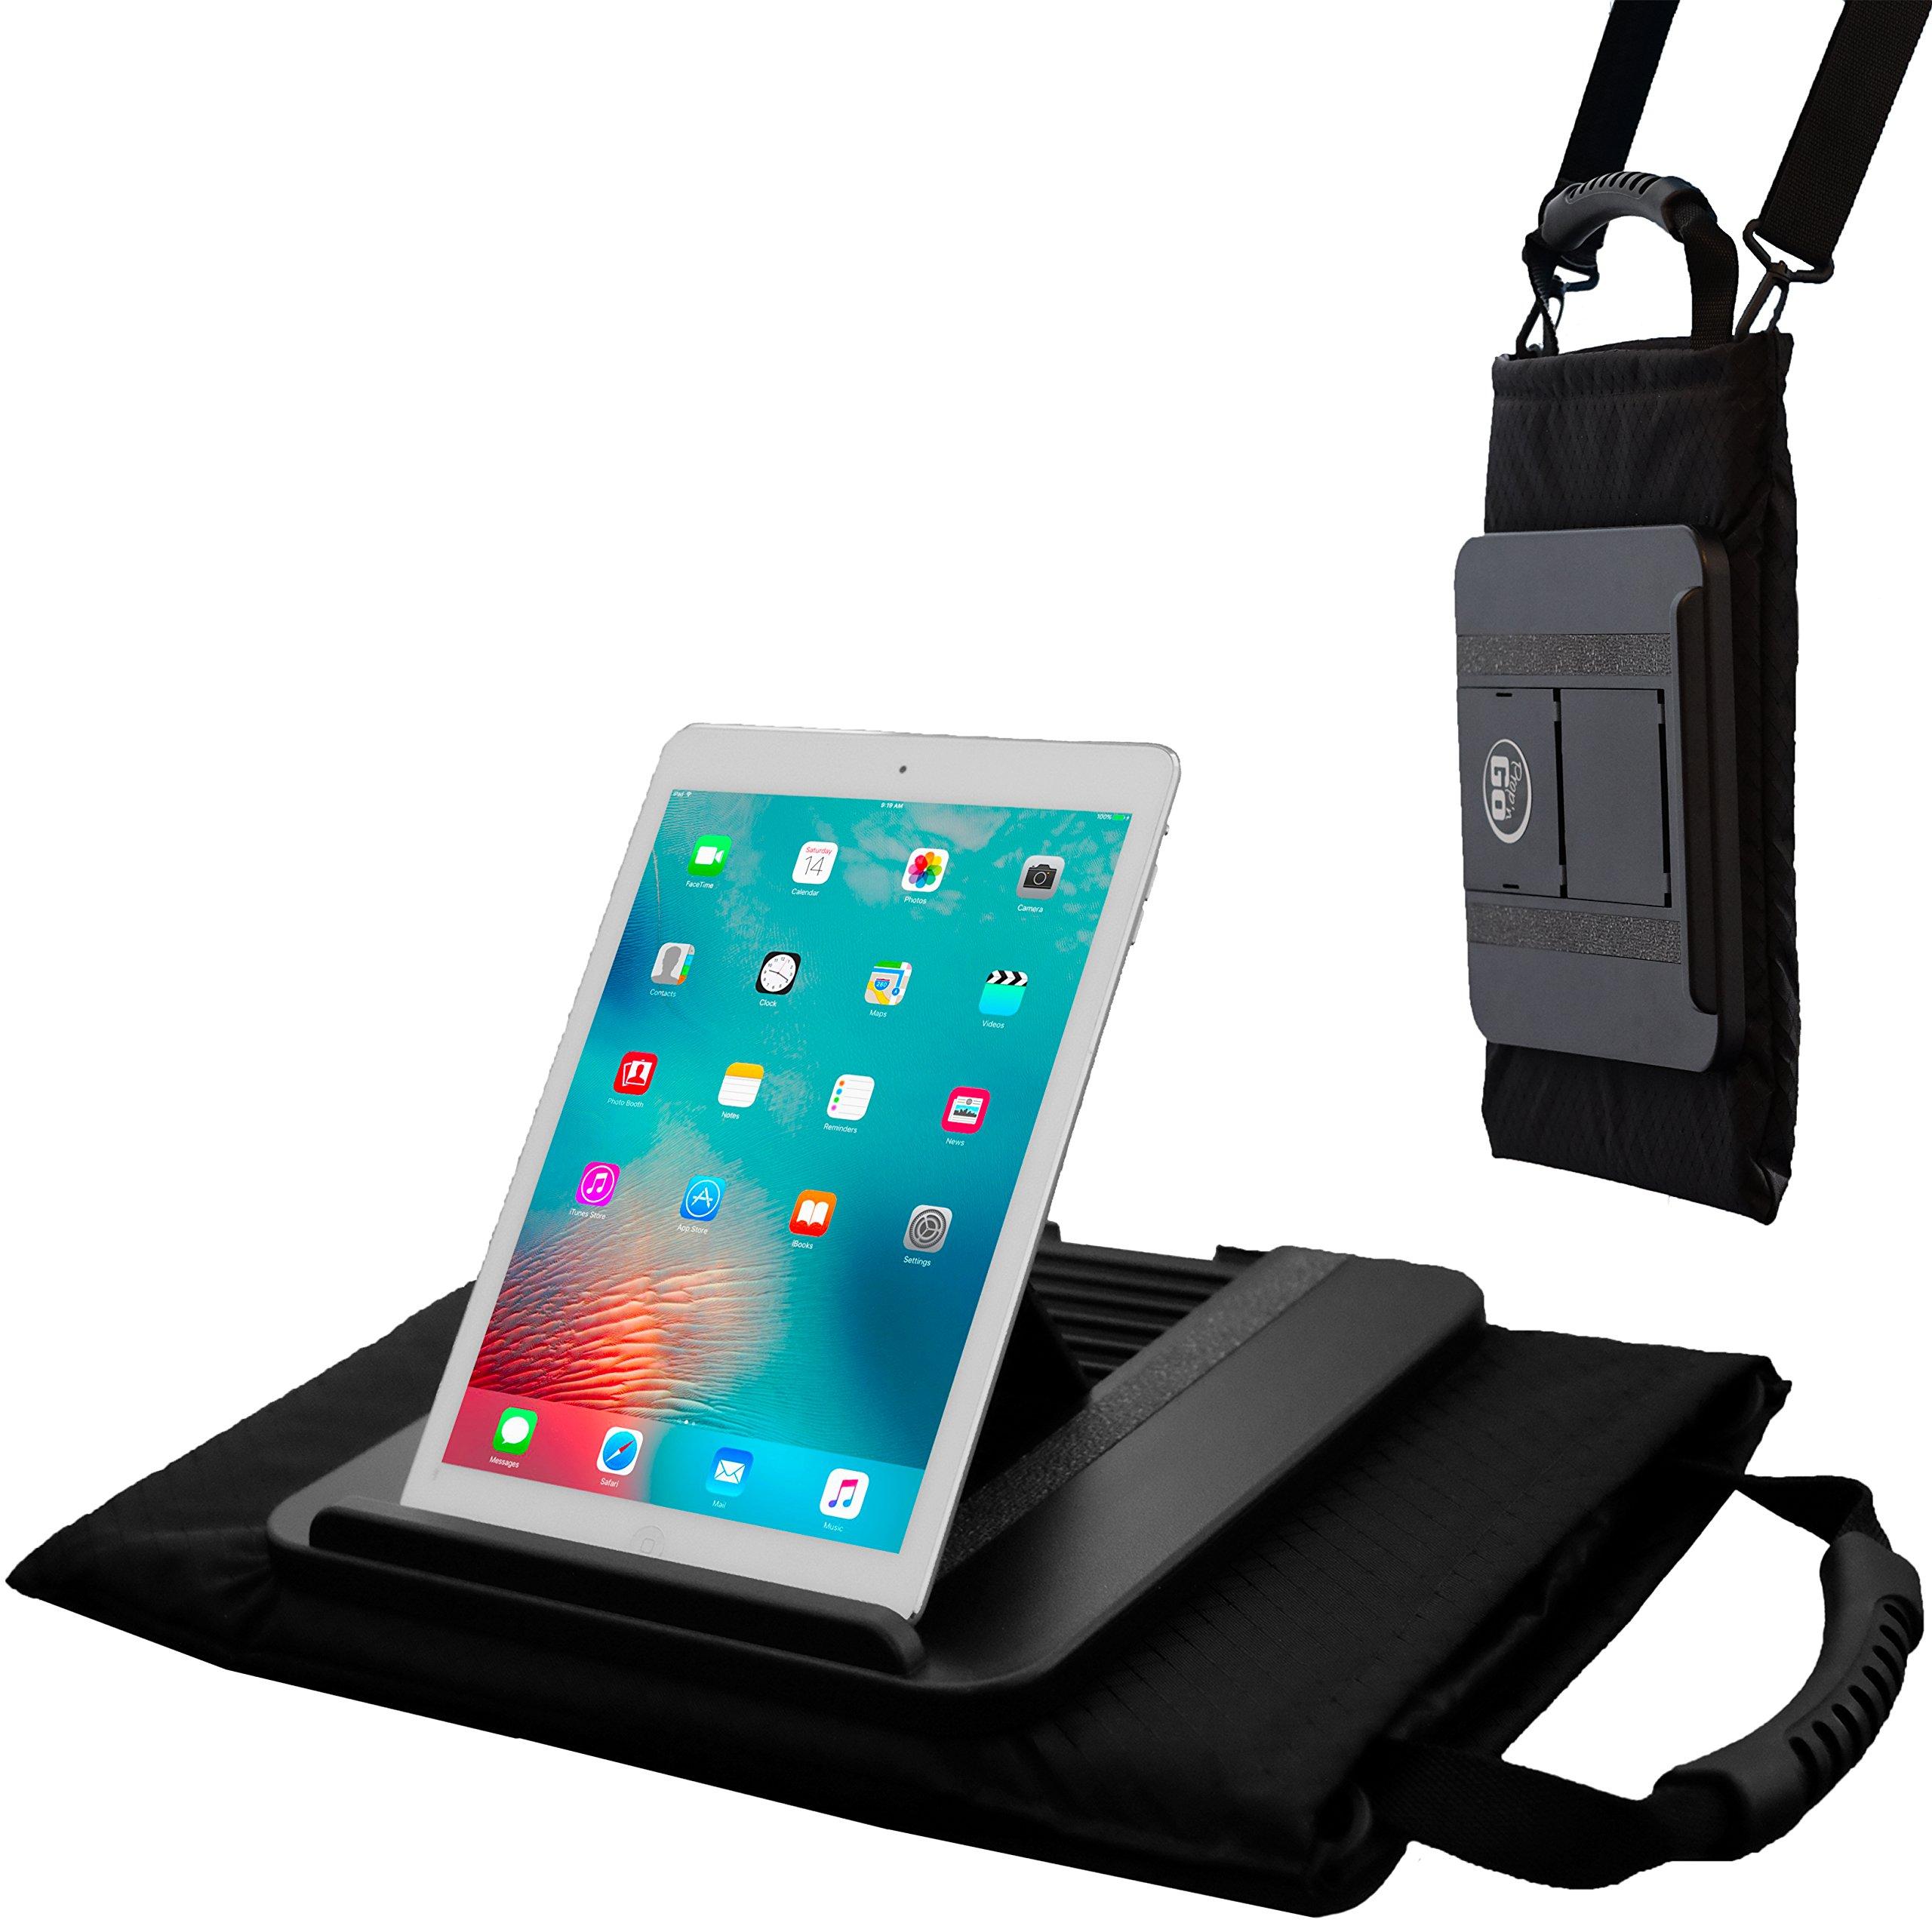 Prop 'n Go Tote // XL Multi-Angle Lap Desk + Messenger Bag // PILLOW Base // Built-in HANDLE & SHOULDER STRAP // STORAGE POCKETS & Stylus Holder // For iPad (Air,mini,Pro), iPhone, MacBook, & Tablets